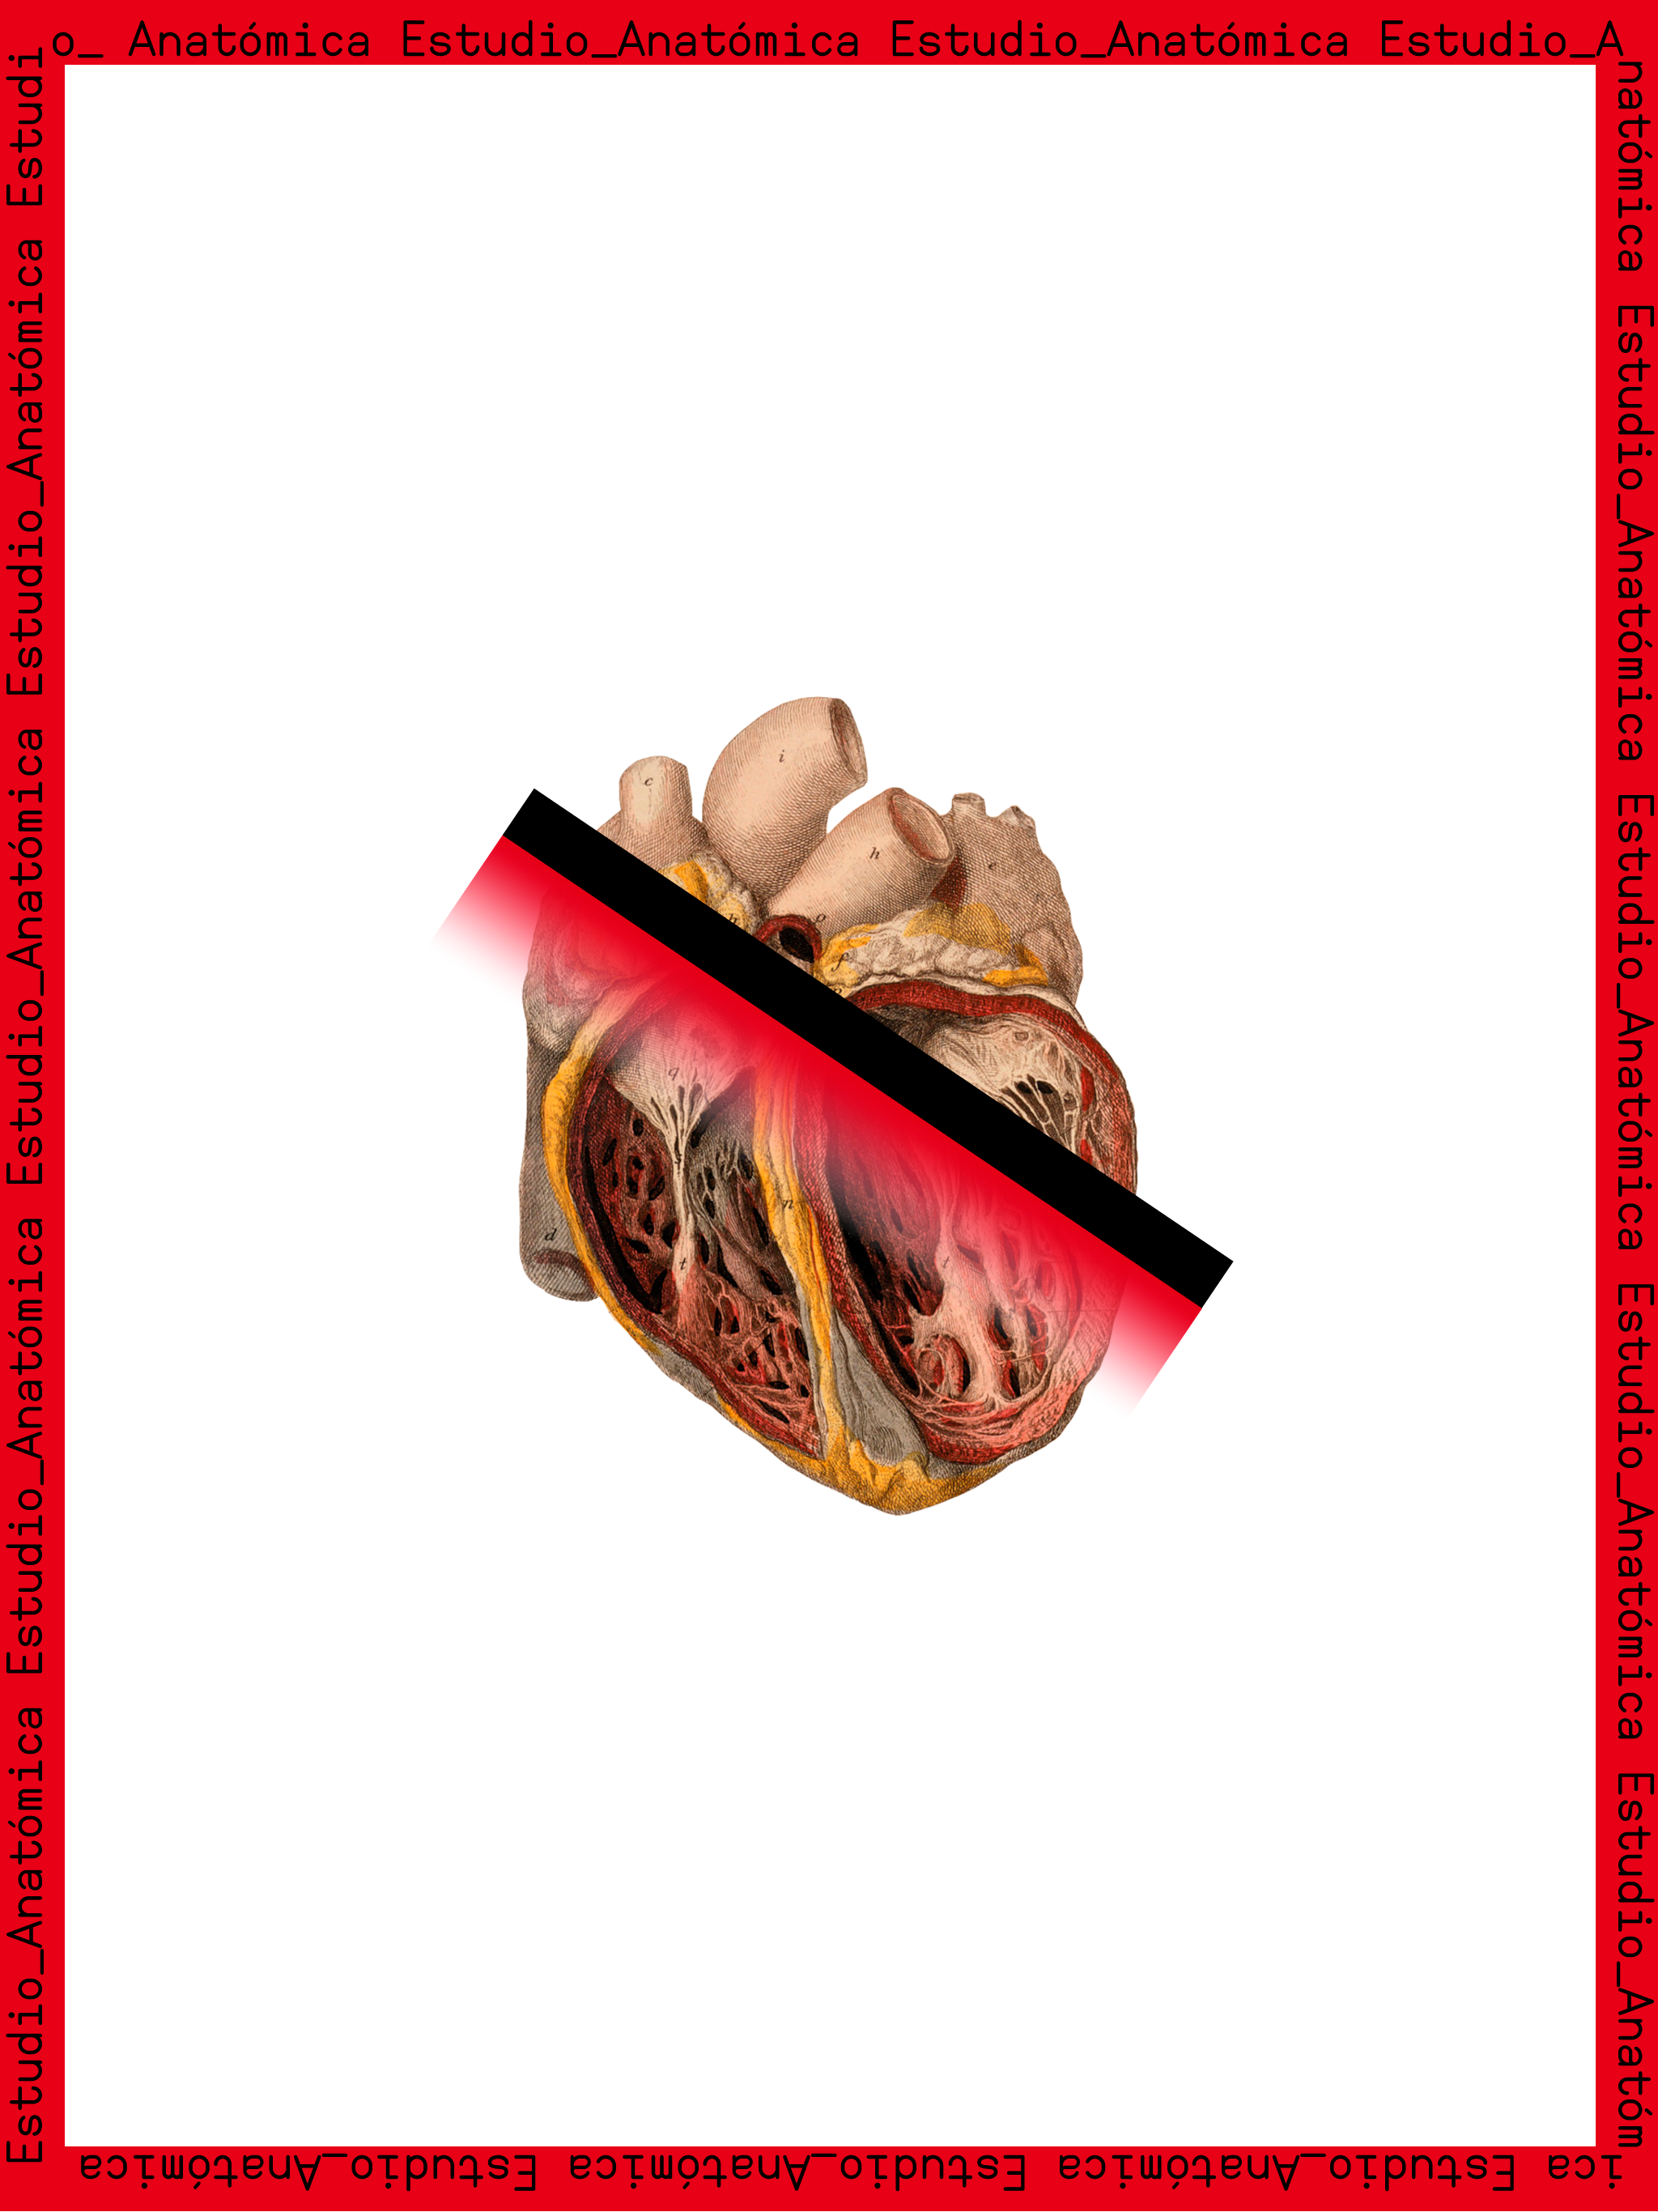 anatomica5